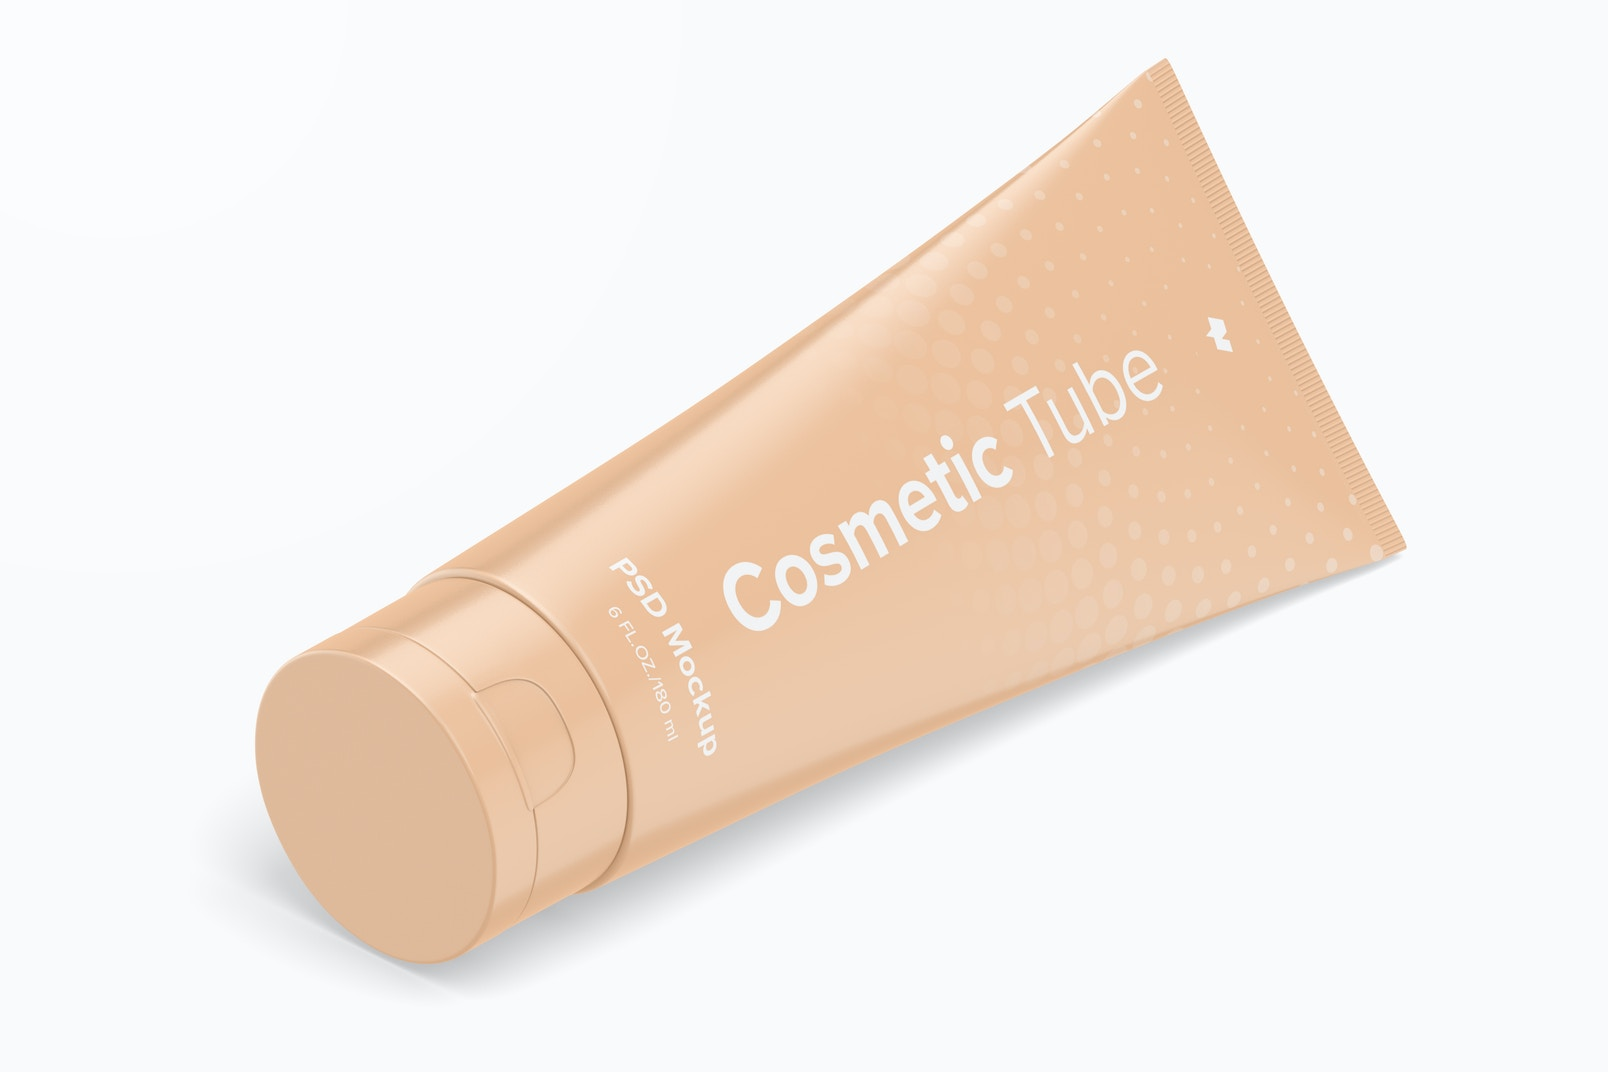 180 ml Cosmetic Tube Mockup, Isometric